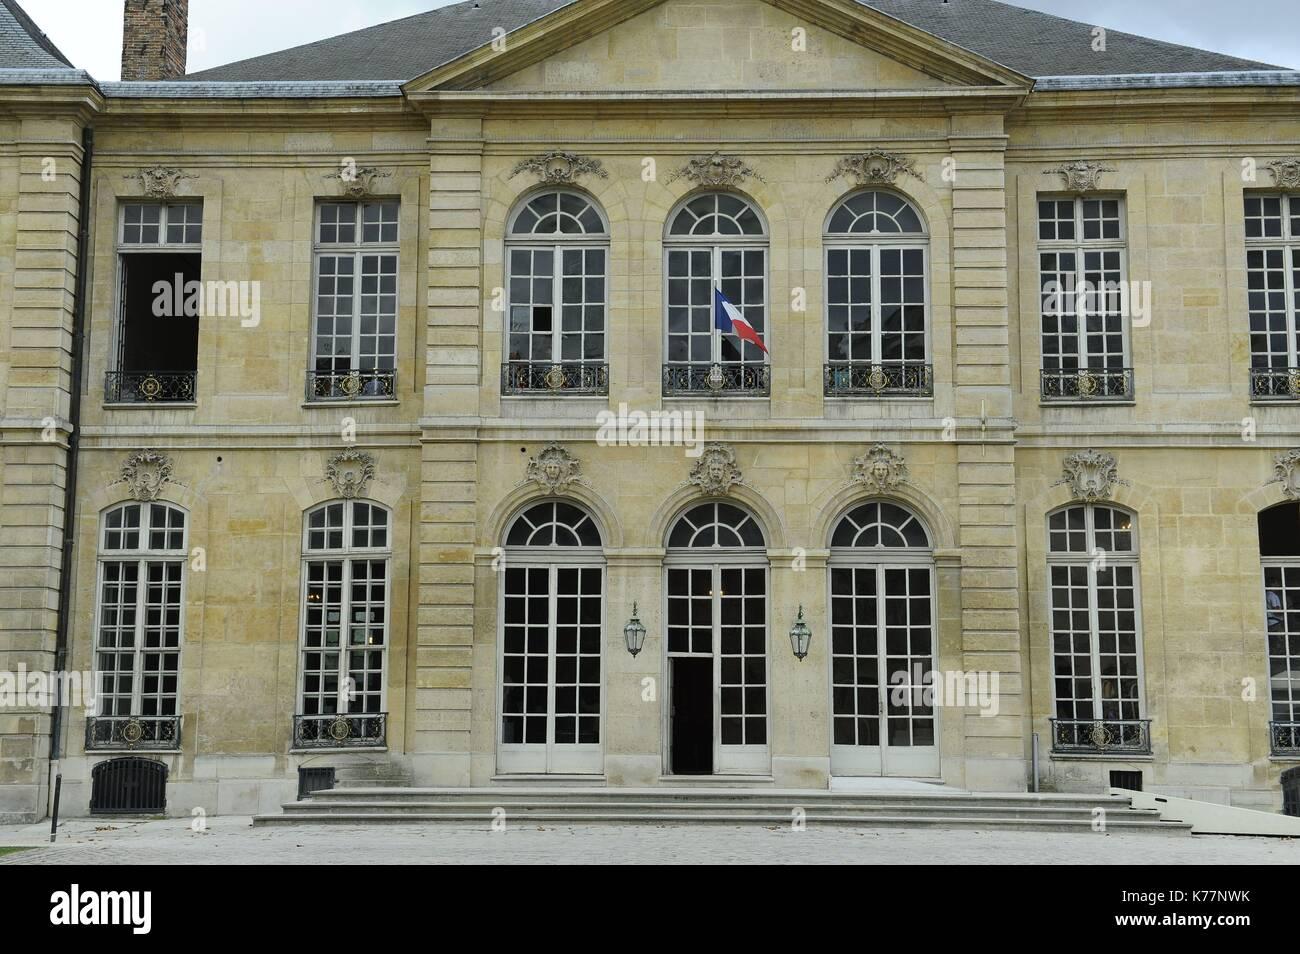 Frankreich, Paris, Rodin Museum, im Hotel Biron Stockbild